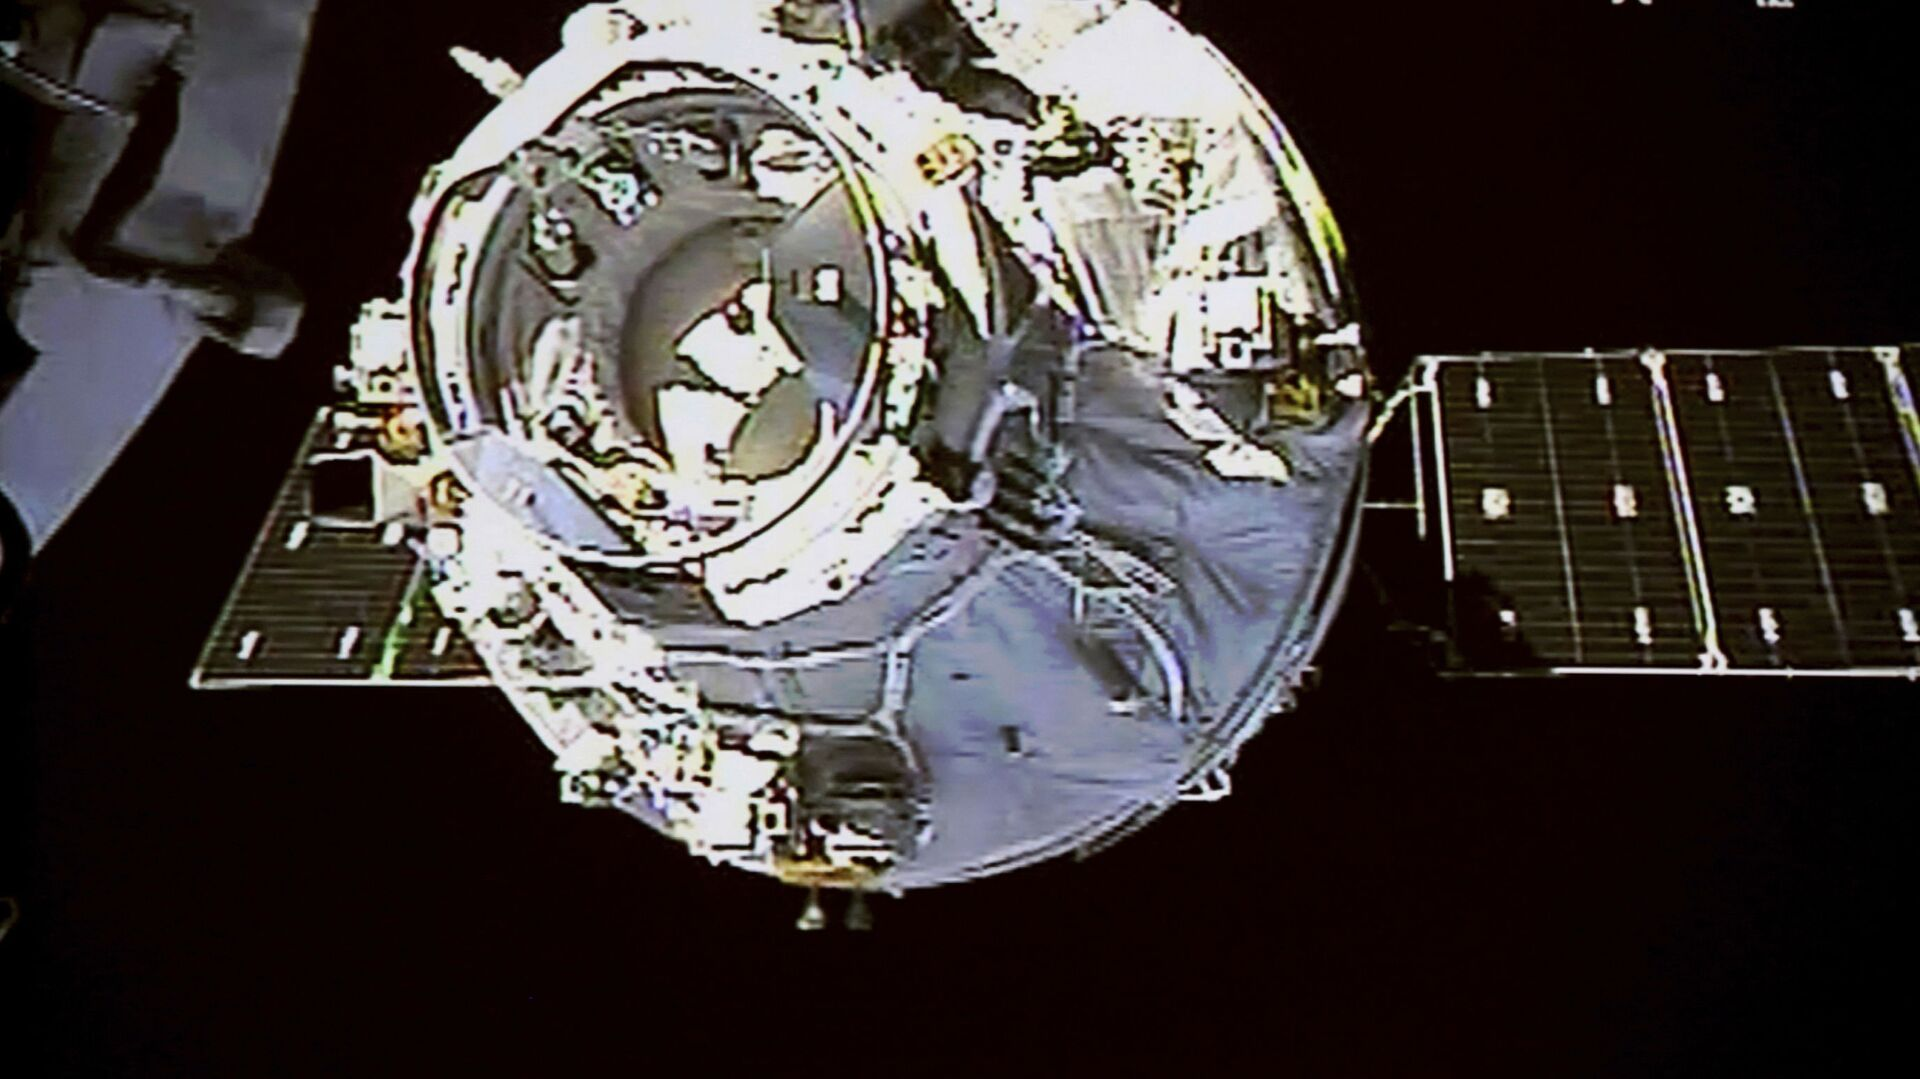 La stazione spaziale cinese Tiangong-1 - Sputnik Italia, 1920, 17.06.2021